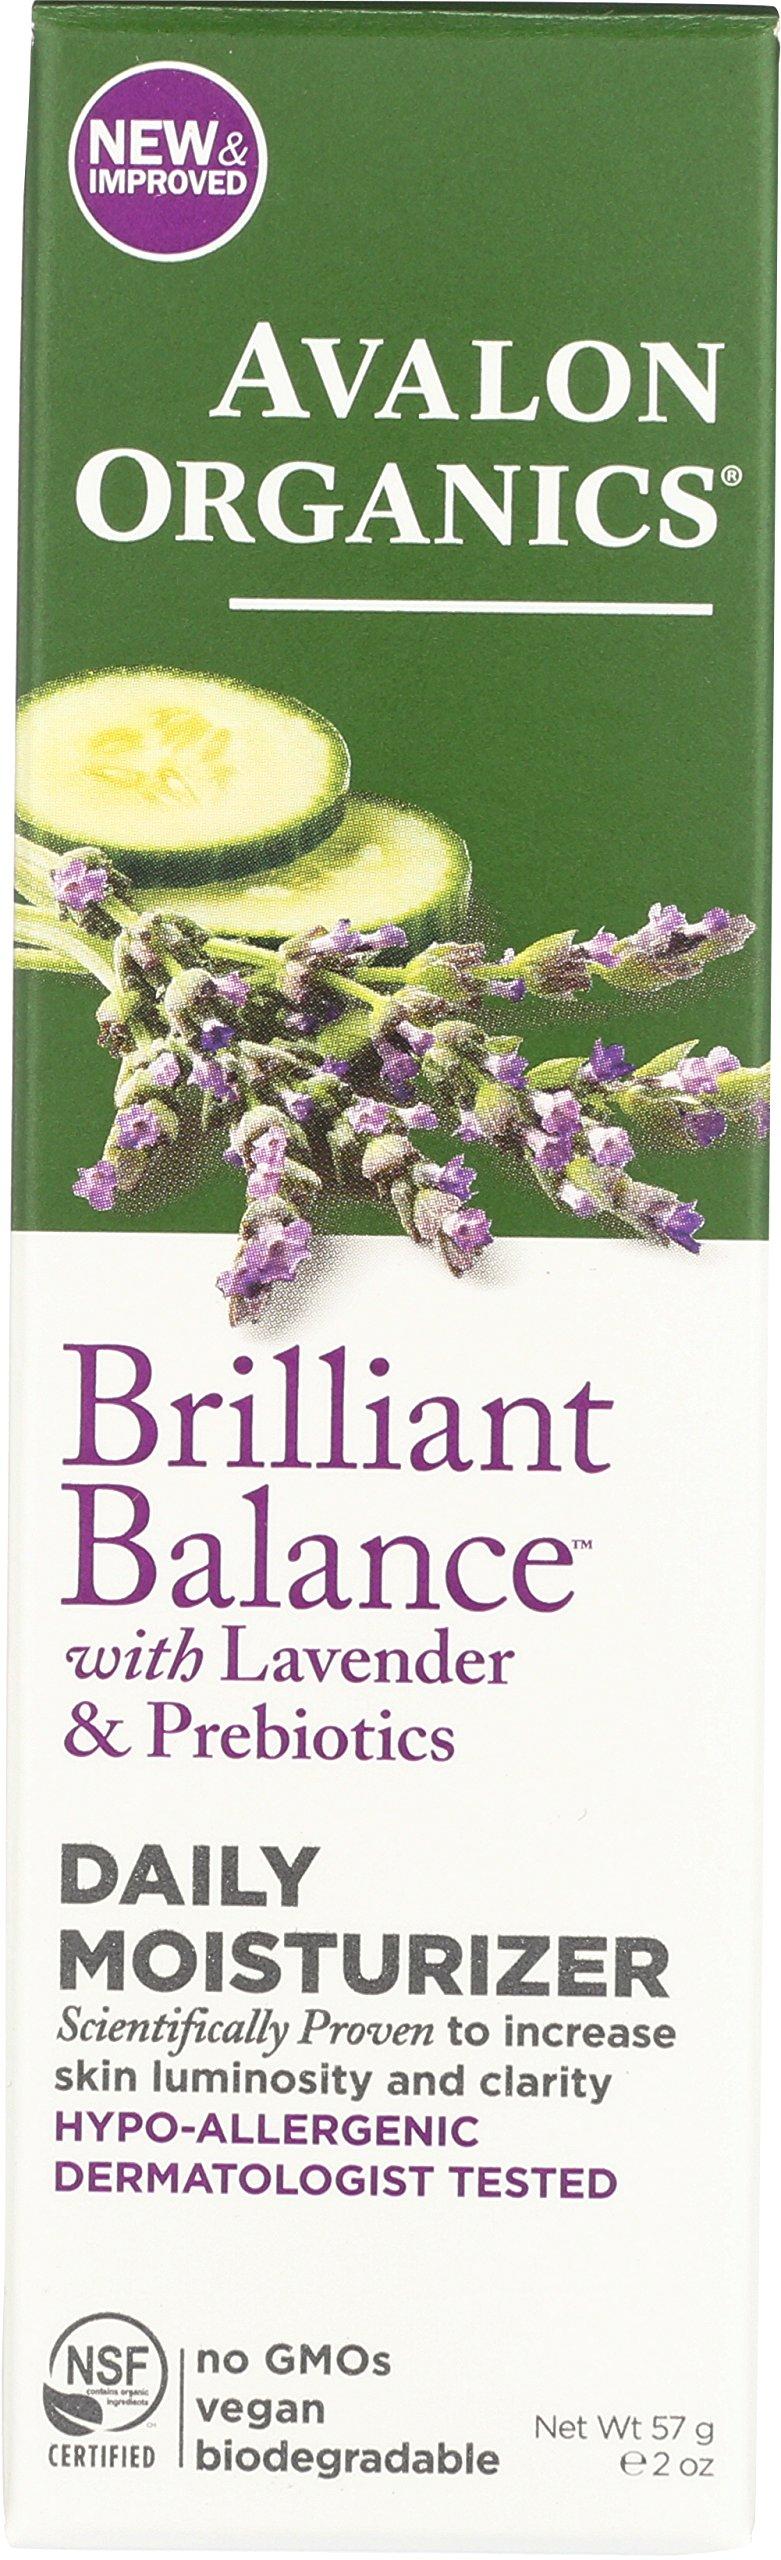 Avalon Organics Brilliant Balance with Lavender & Prebiotics Daily Moisturizer 2 oz